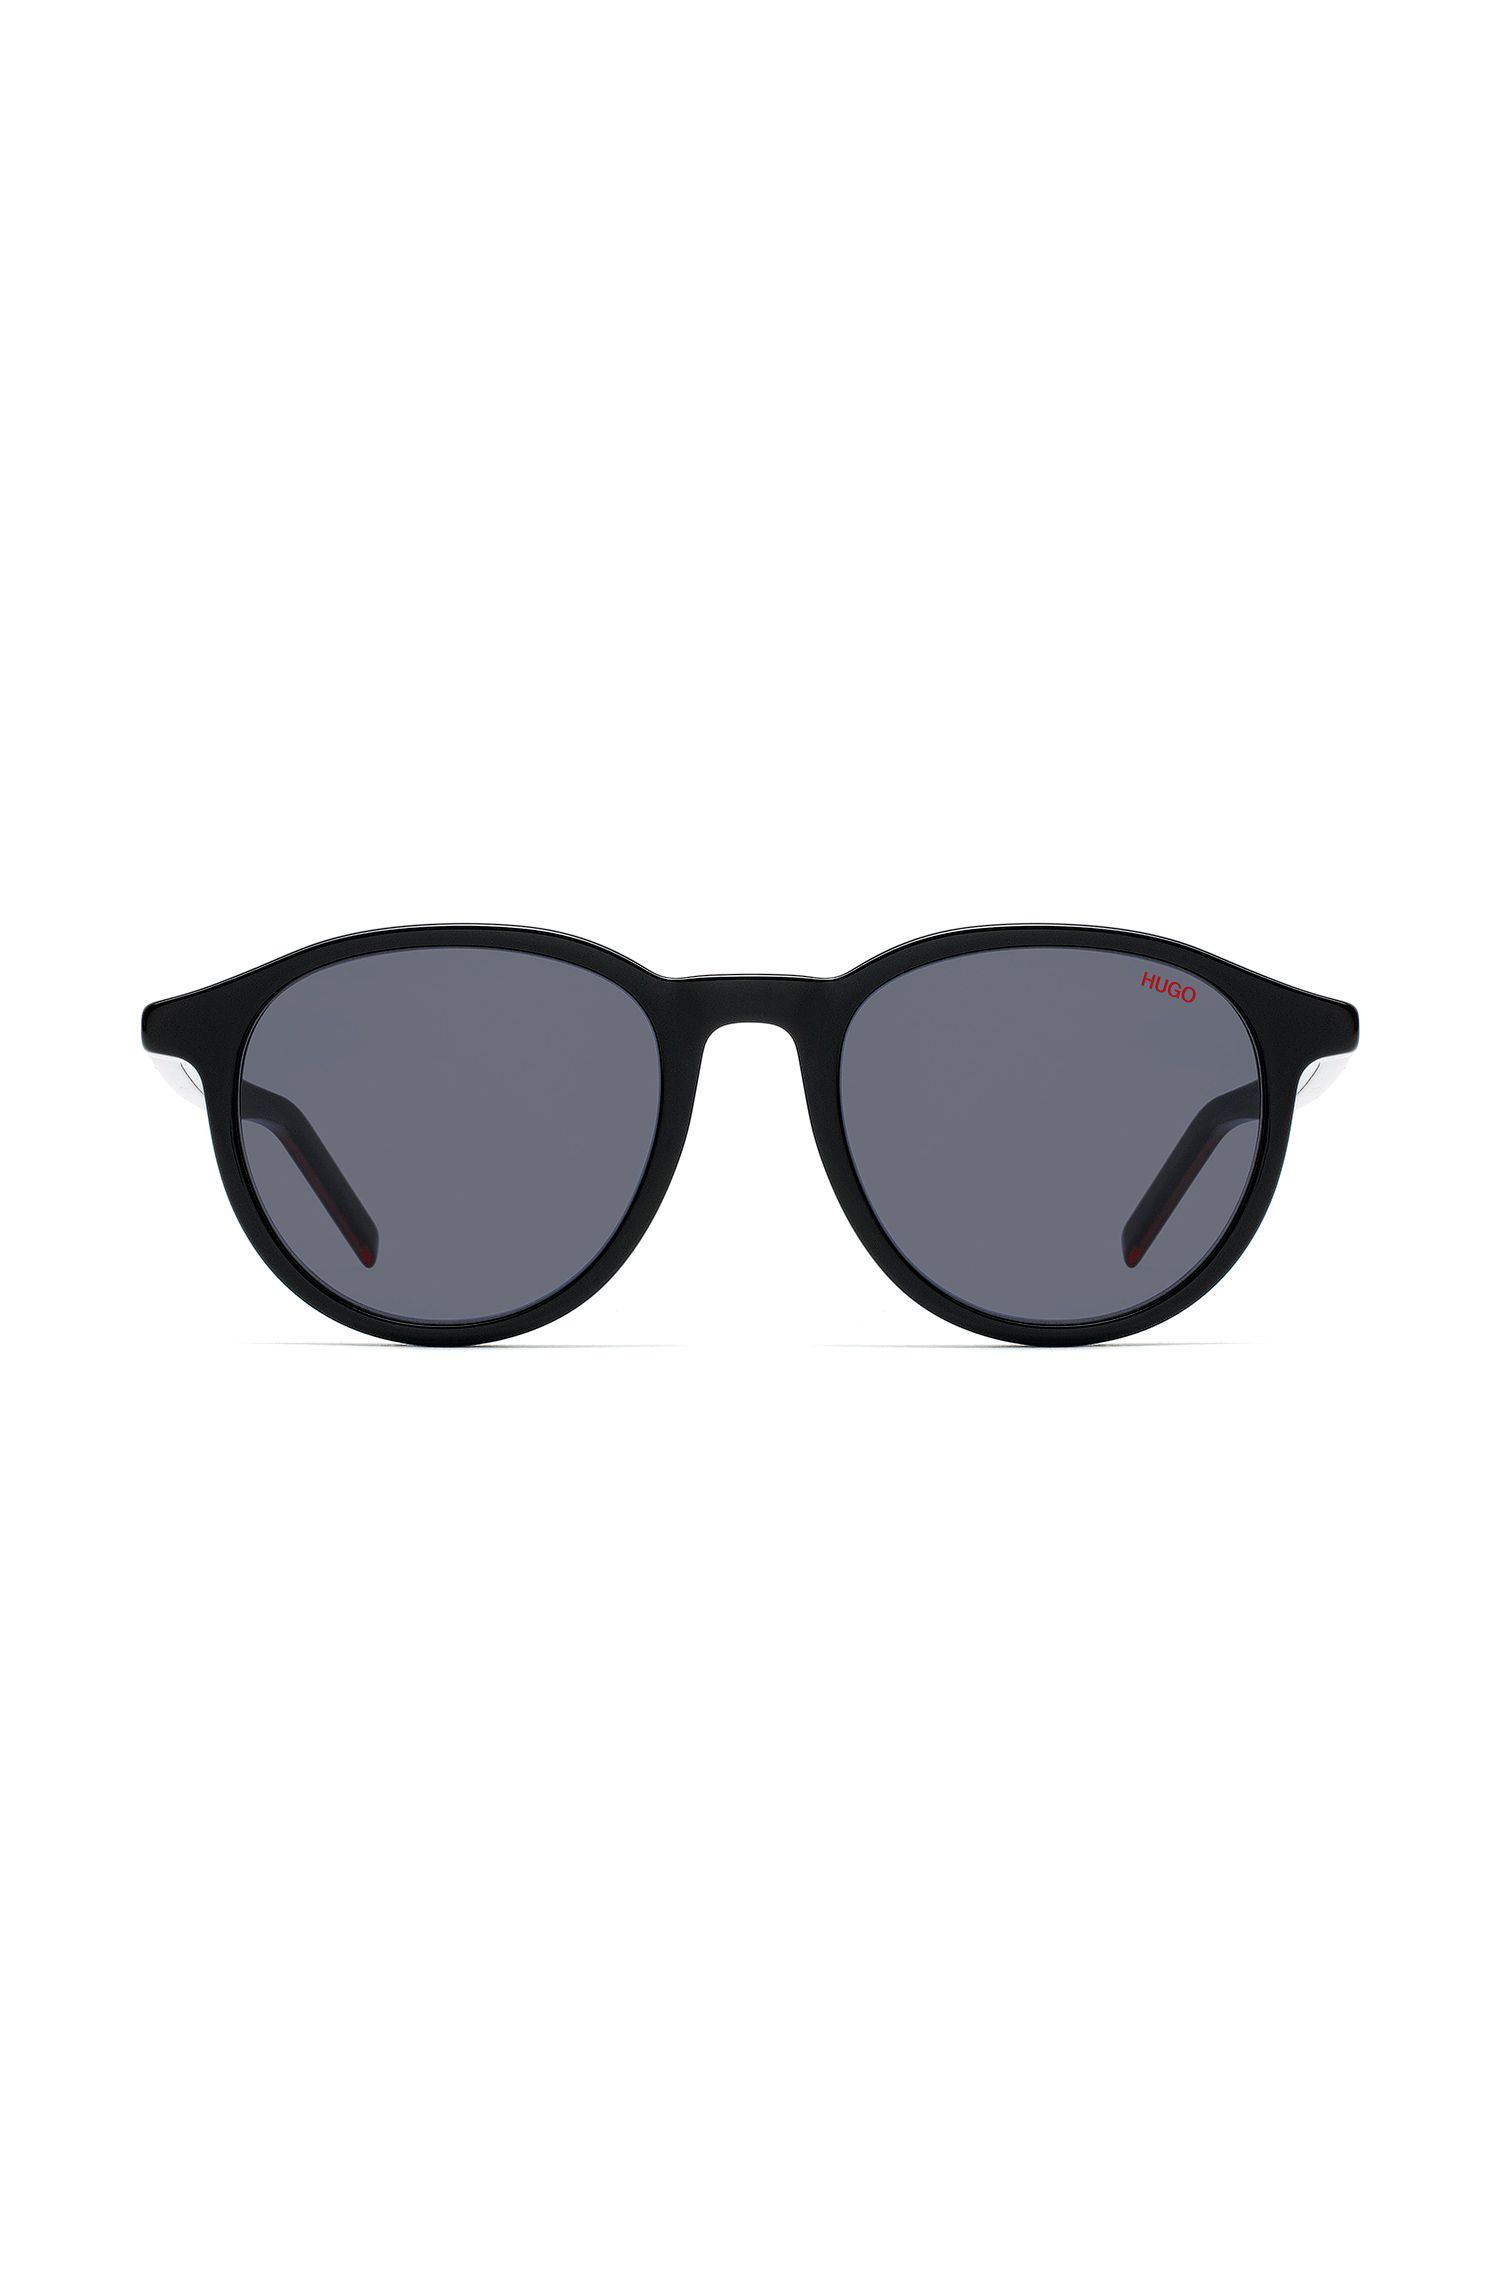 Unisex round sunglasses in multi-layer acetate, Assorted-Pre-Pack